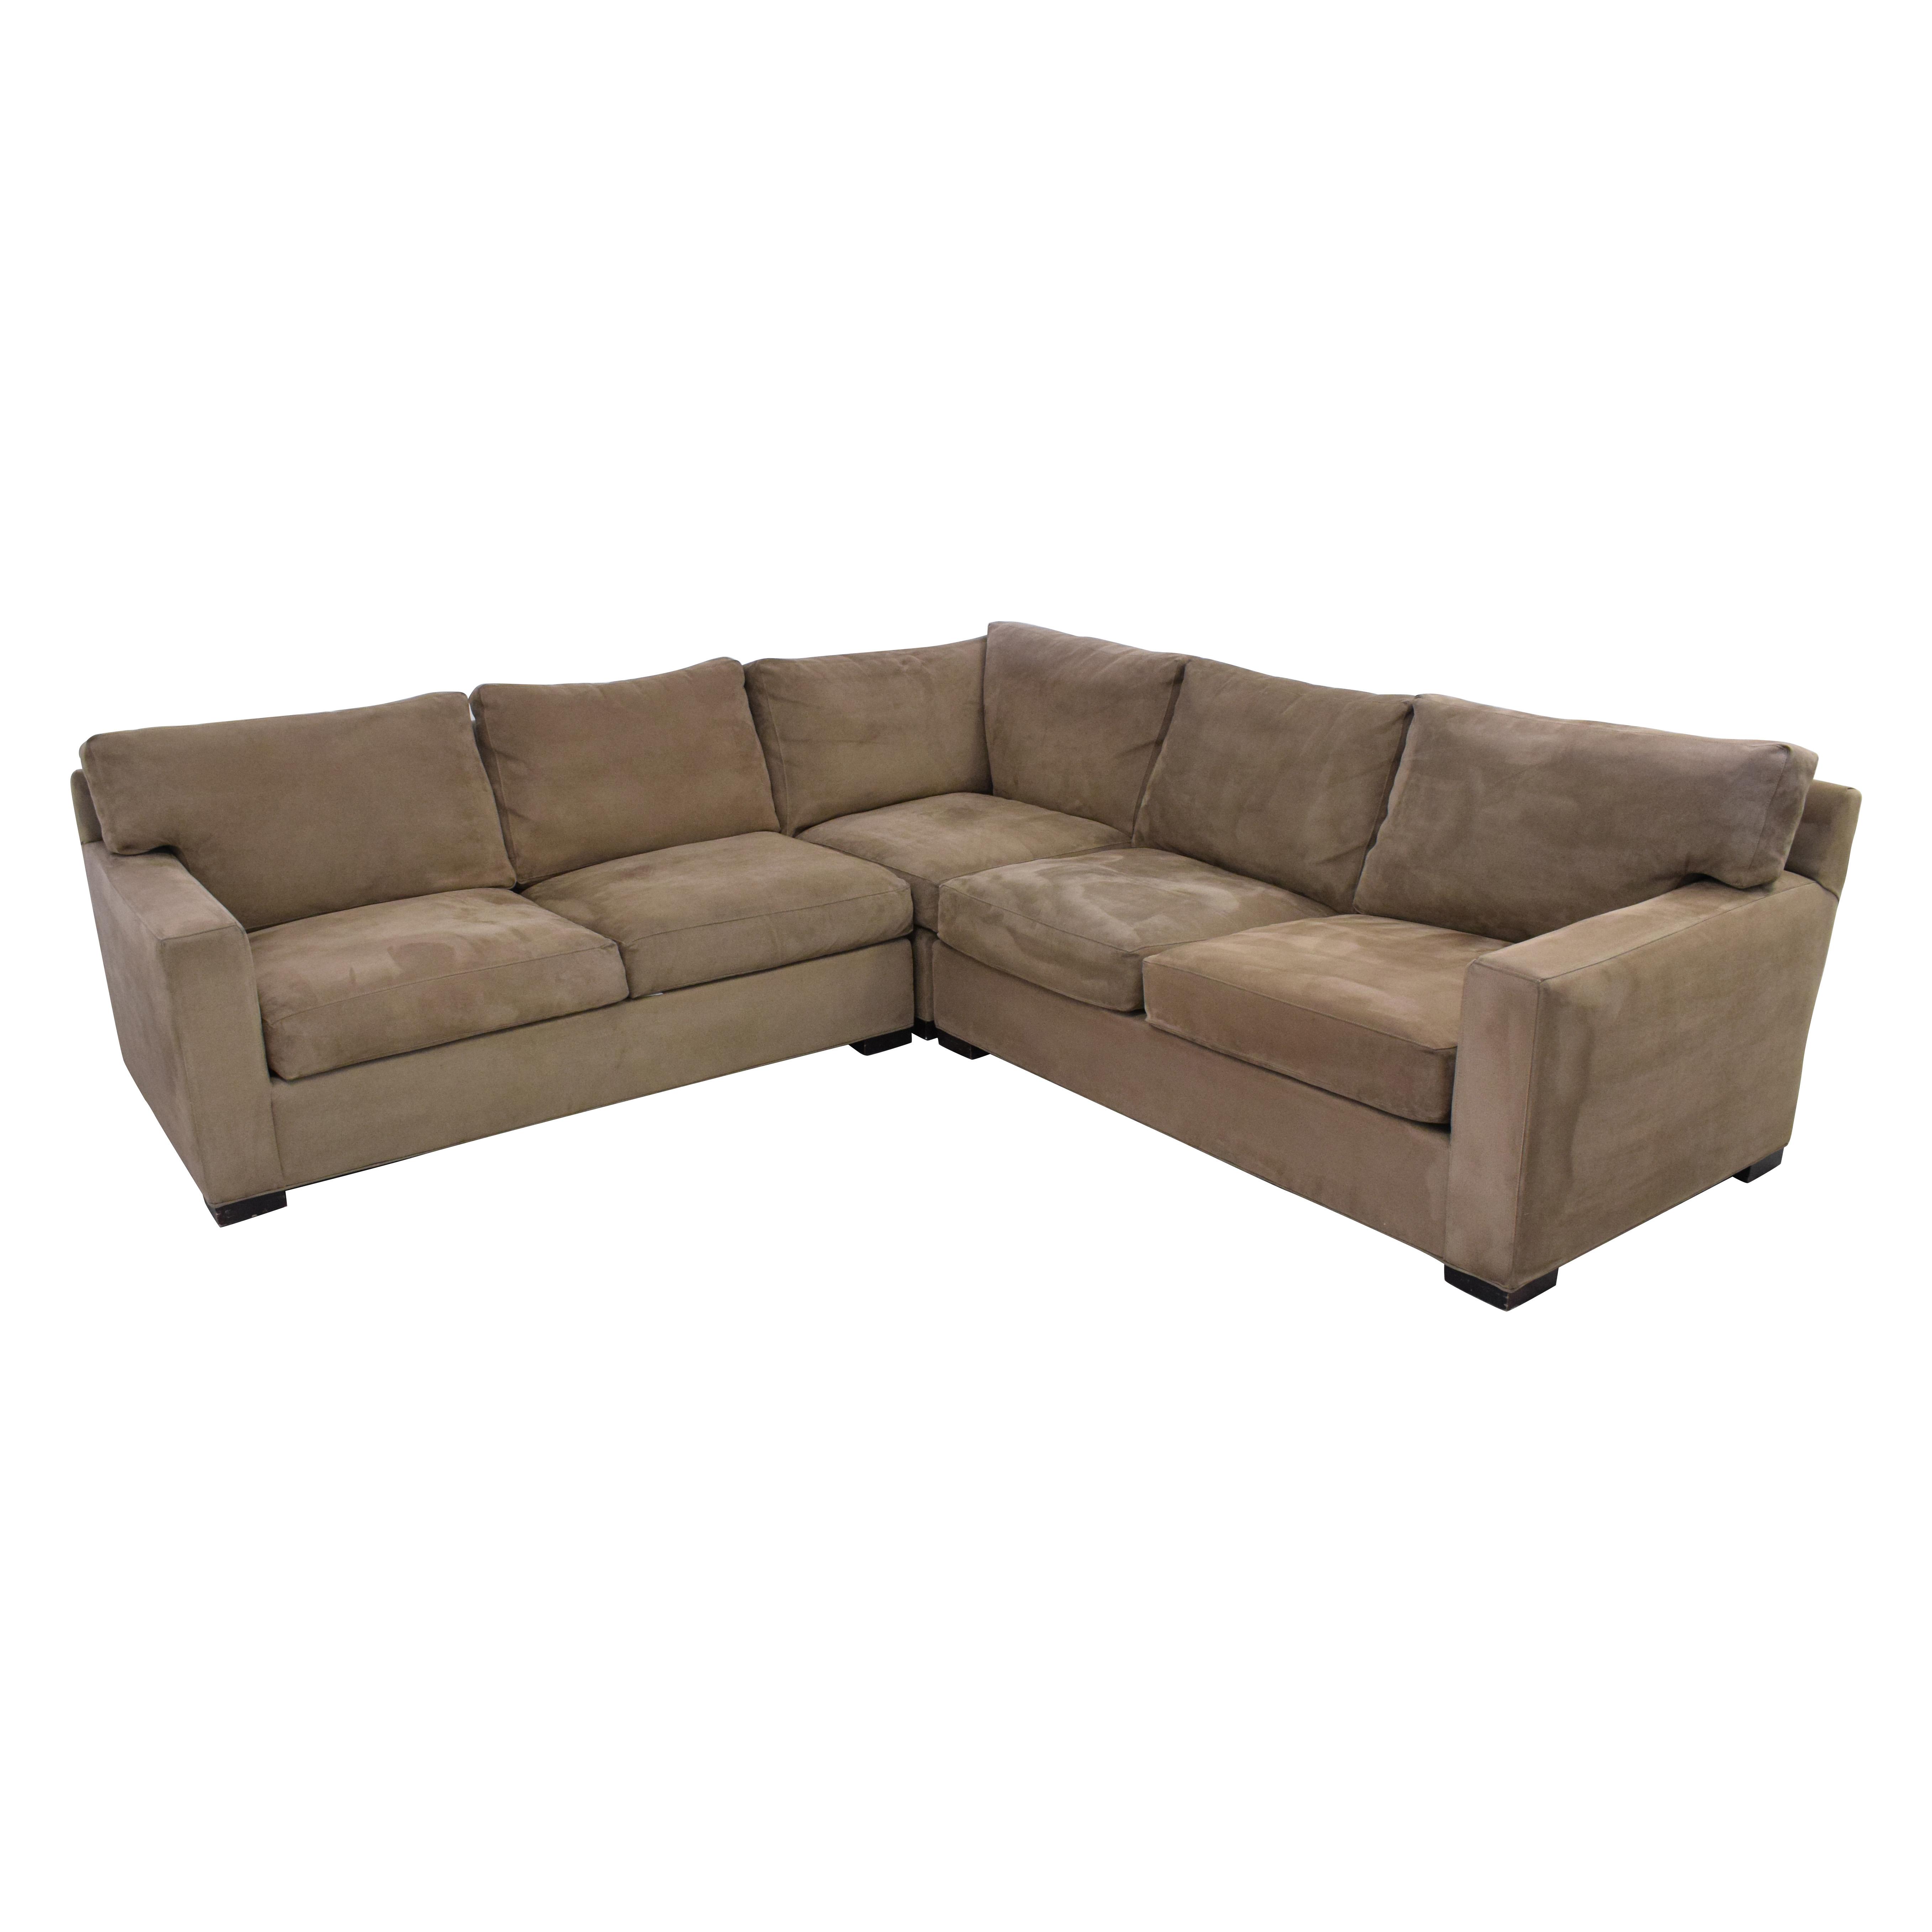 shop Crate & Barrel Crate & Barrel Axis II 3-Piece Sectional Sofa online